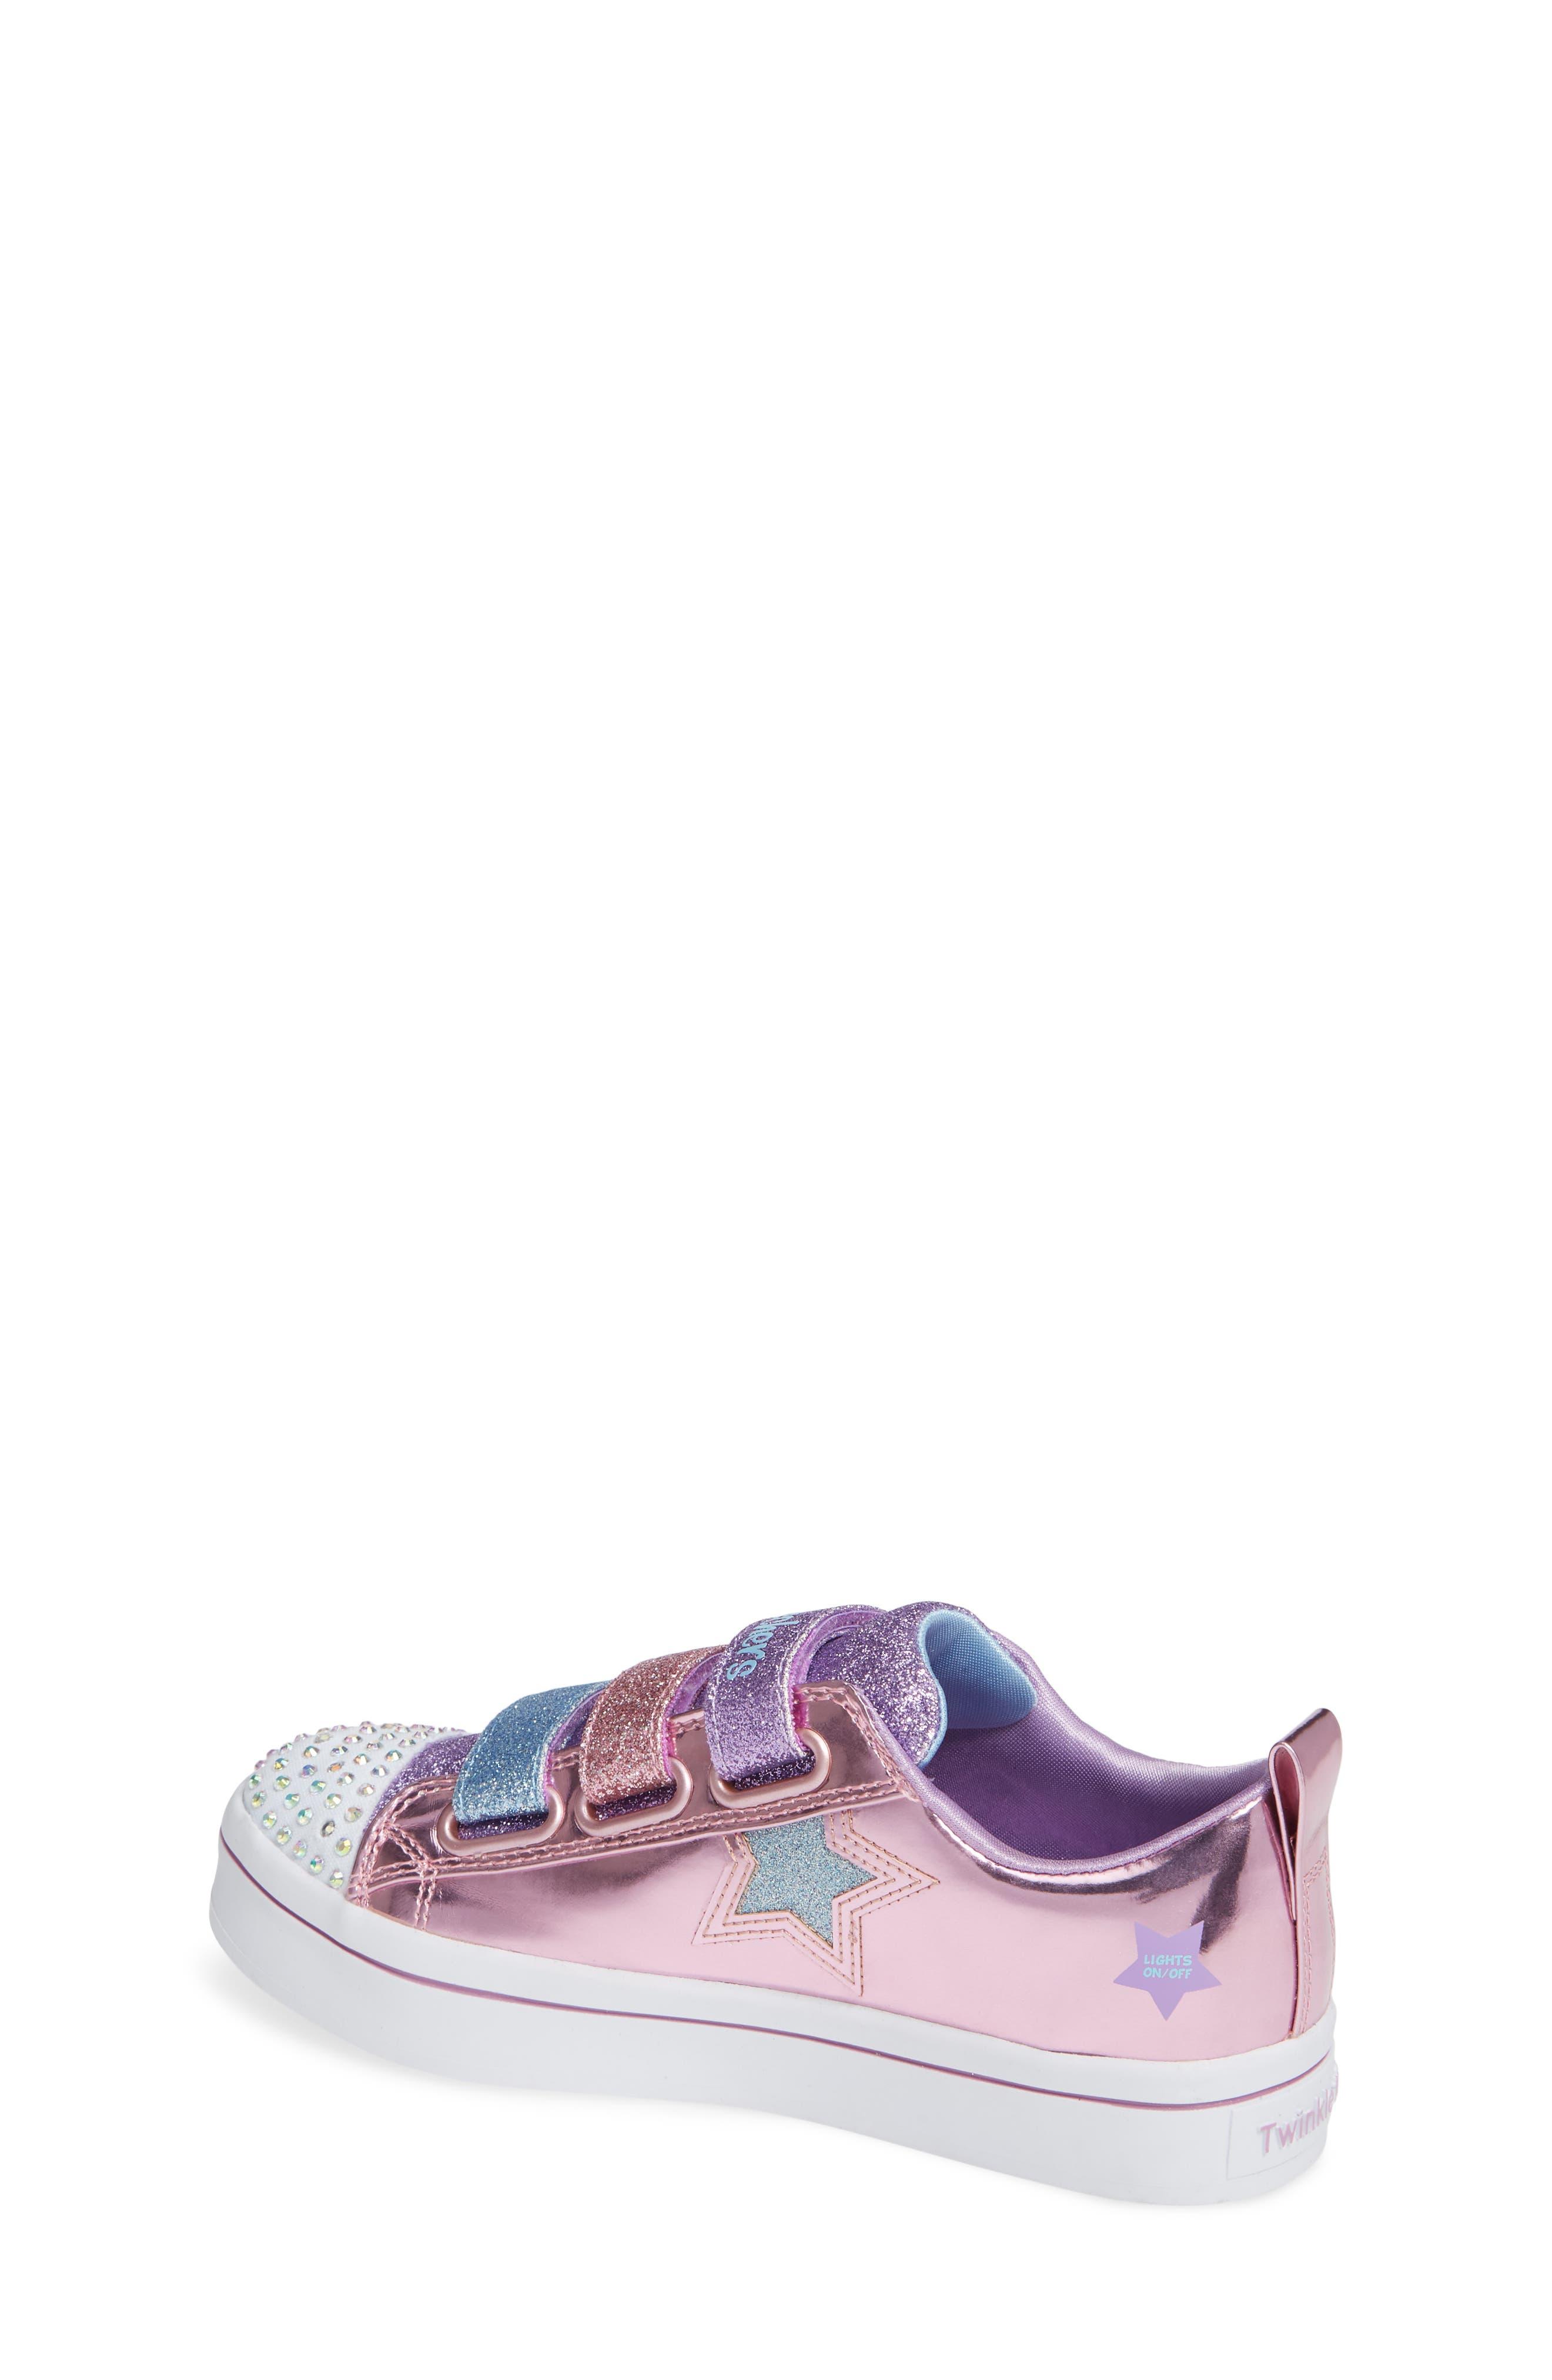 Twi-Lites Star Light-Up Sneaker,                             Alternate thumbnail 2, color,                             PINK/ MULTI